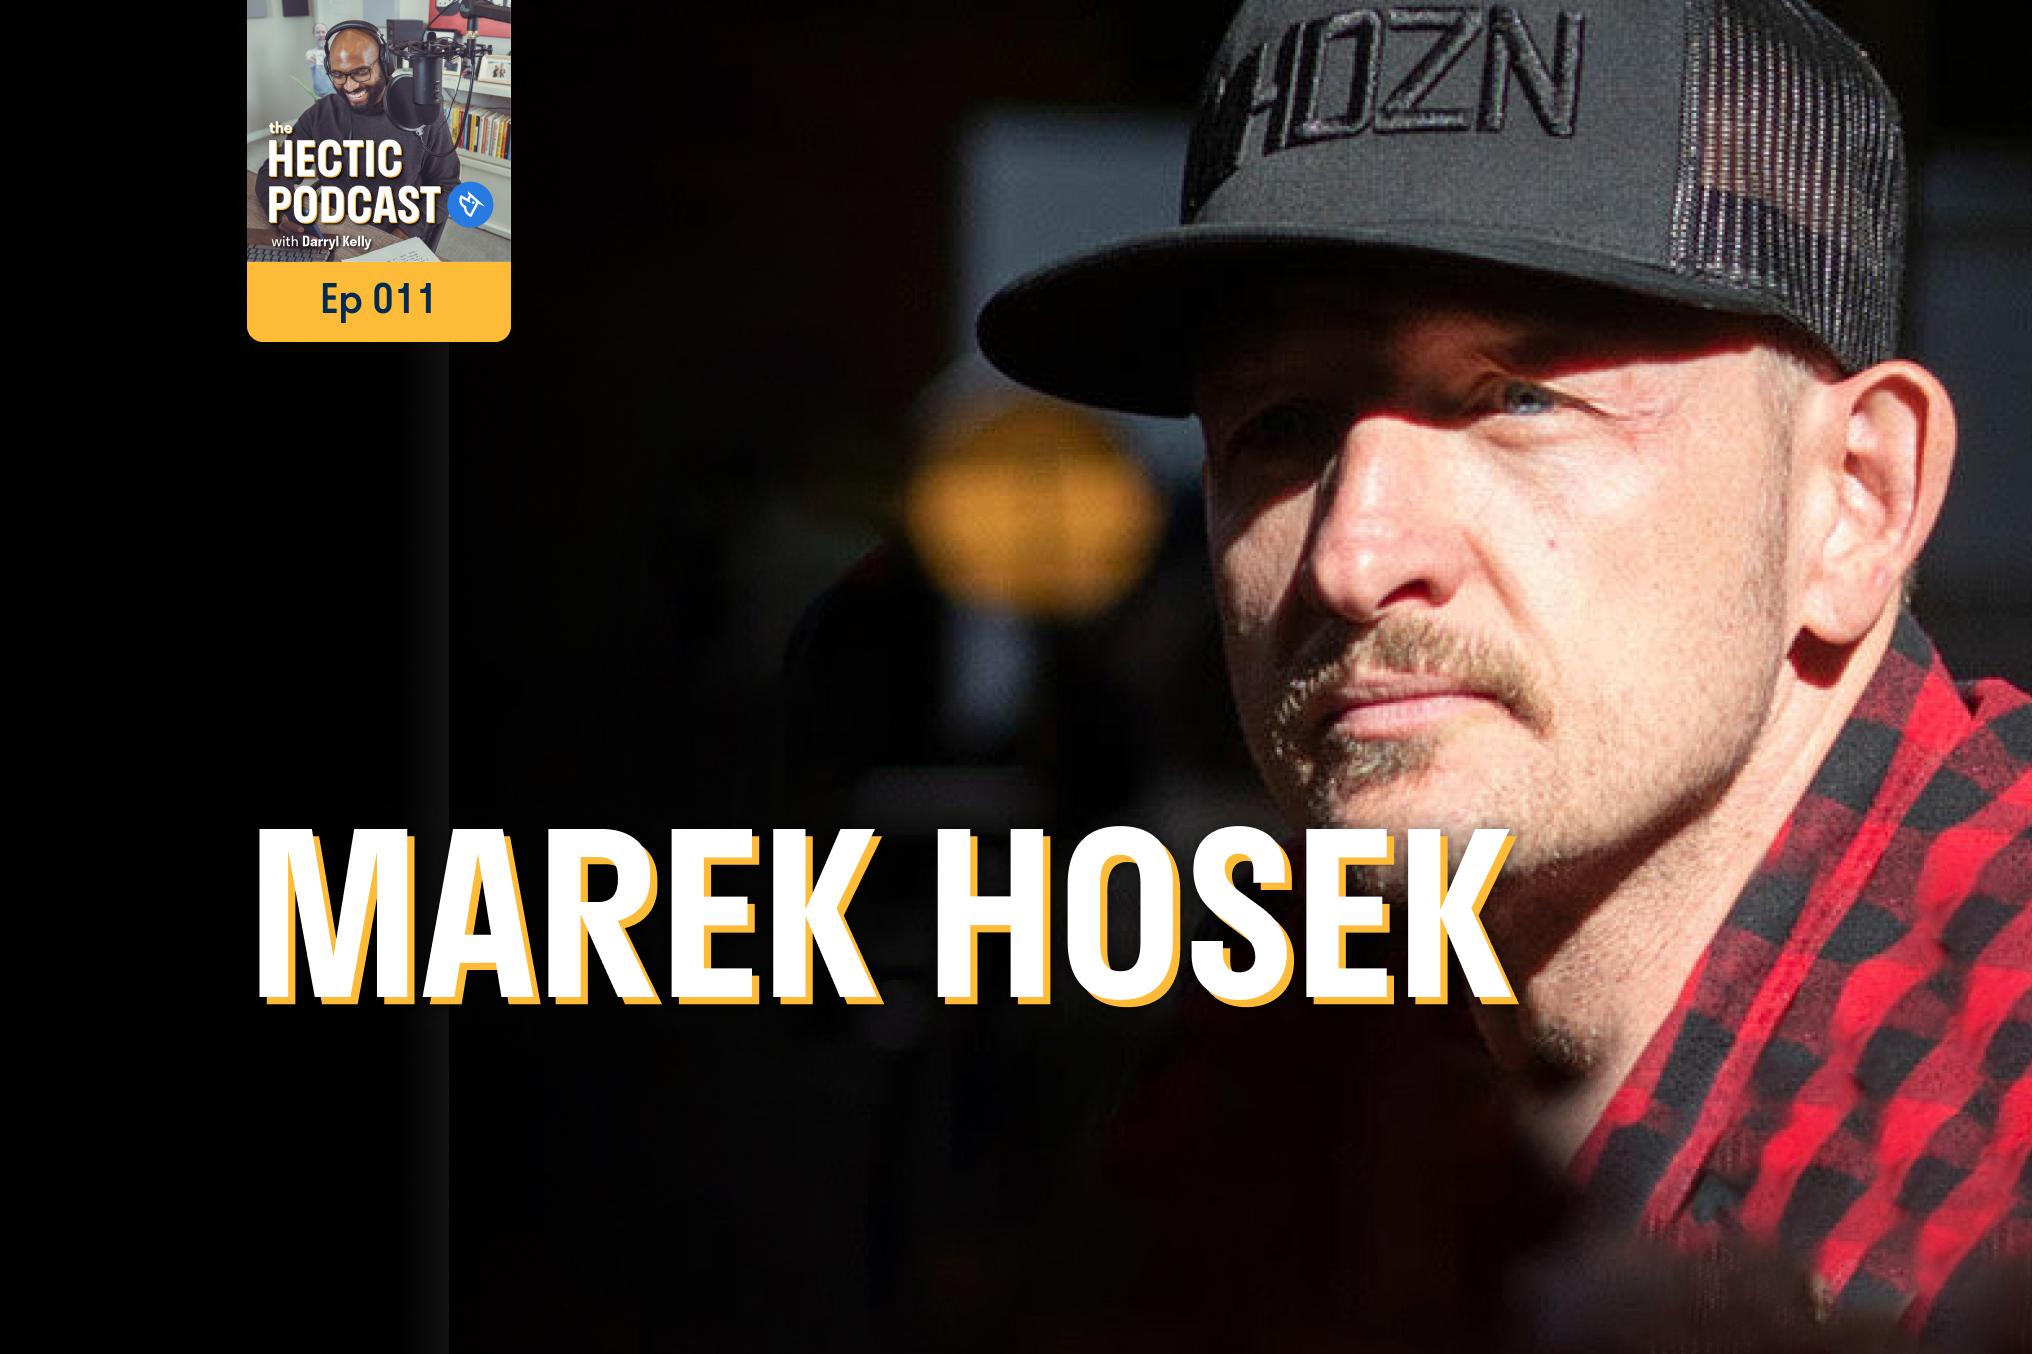 Marek Hosek